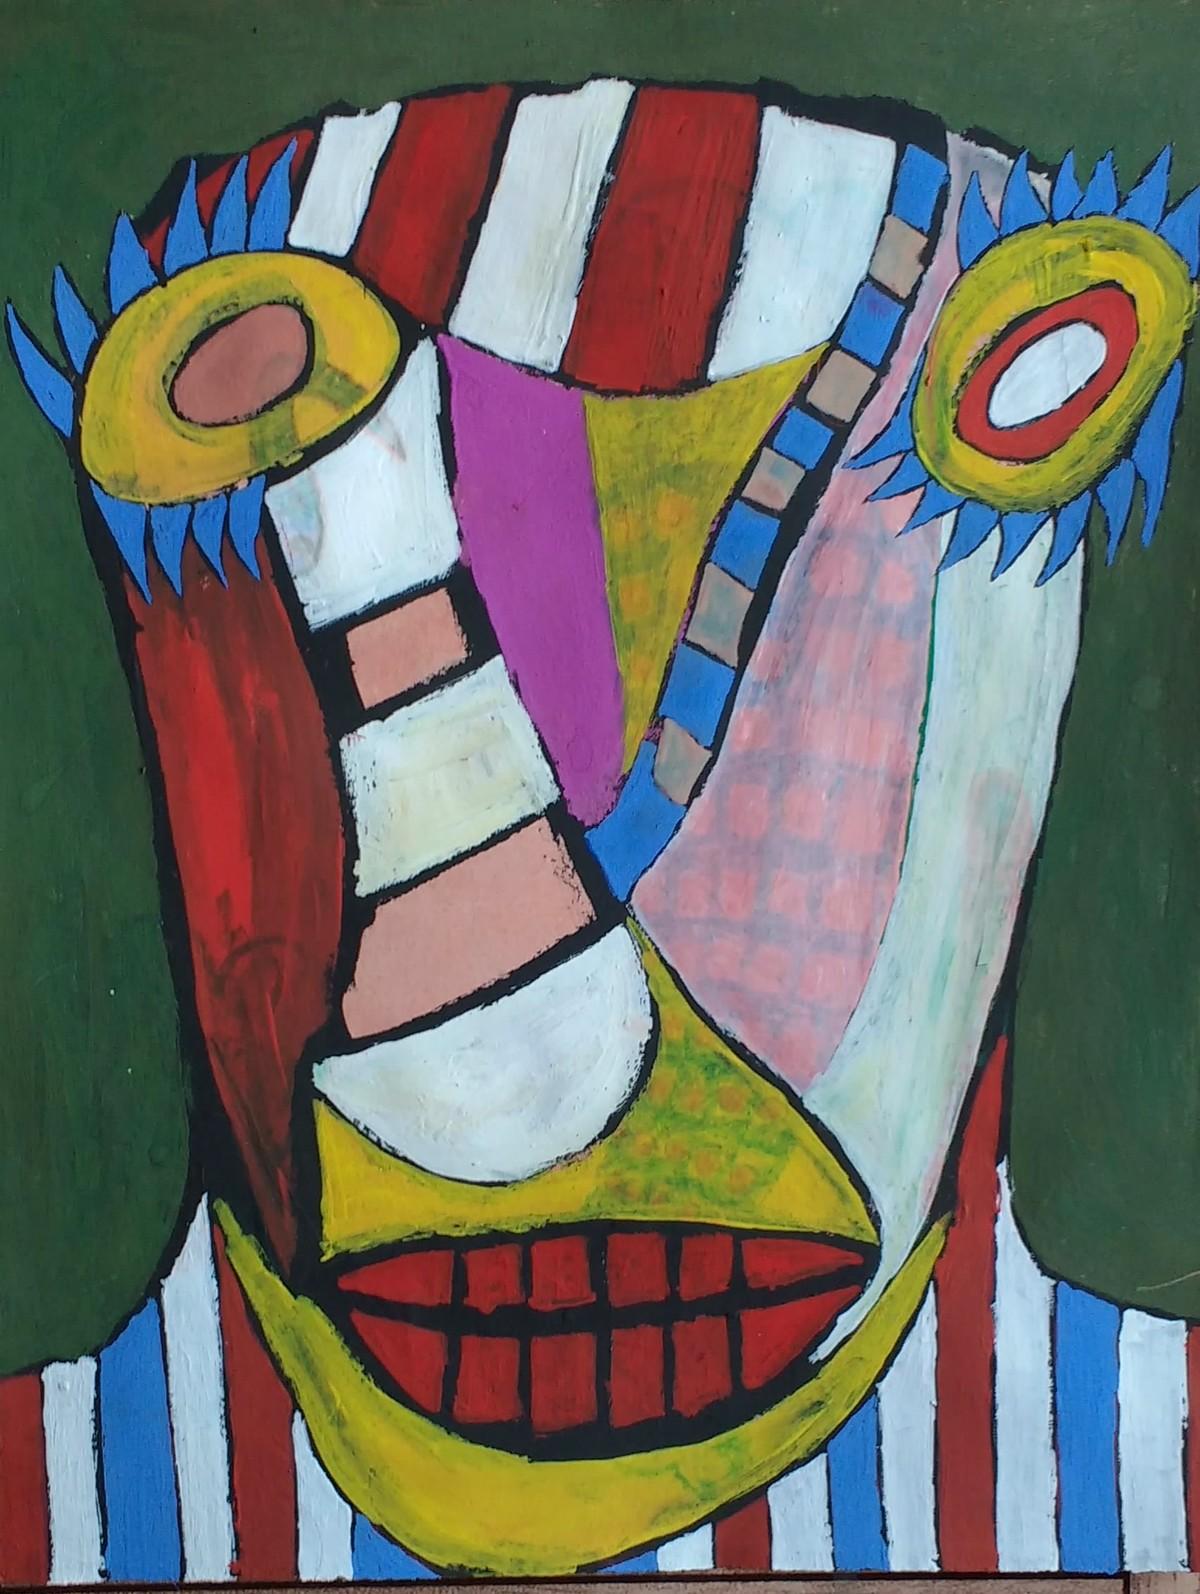 Self-portrait by Manoj Kumar Negi, Fantasy Painting, Mixed Media on Paper, Green color